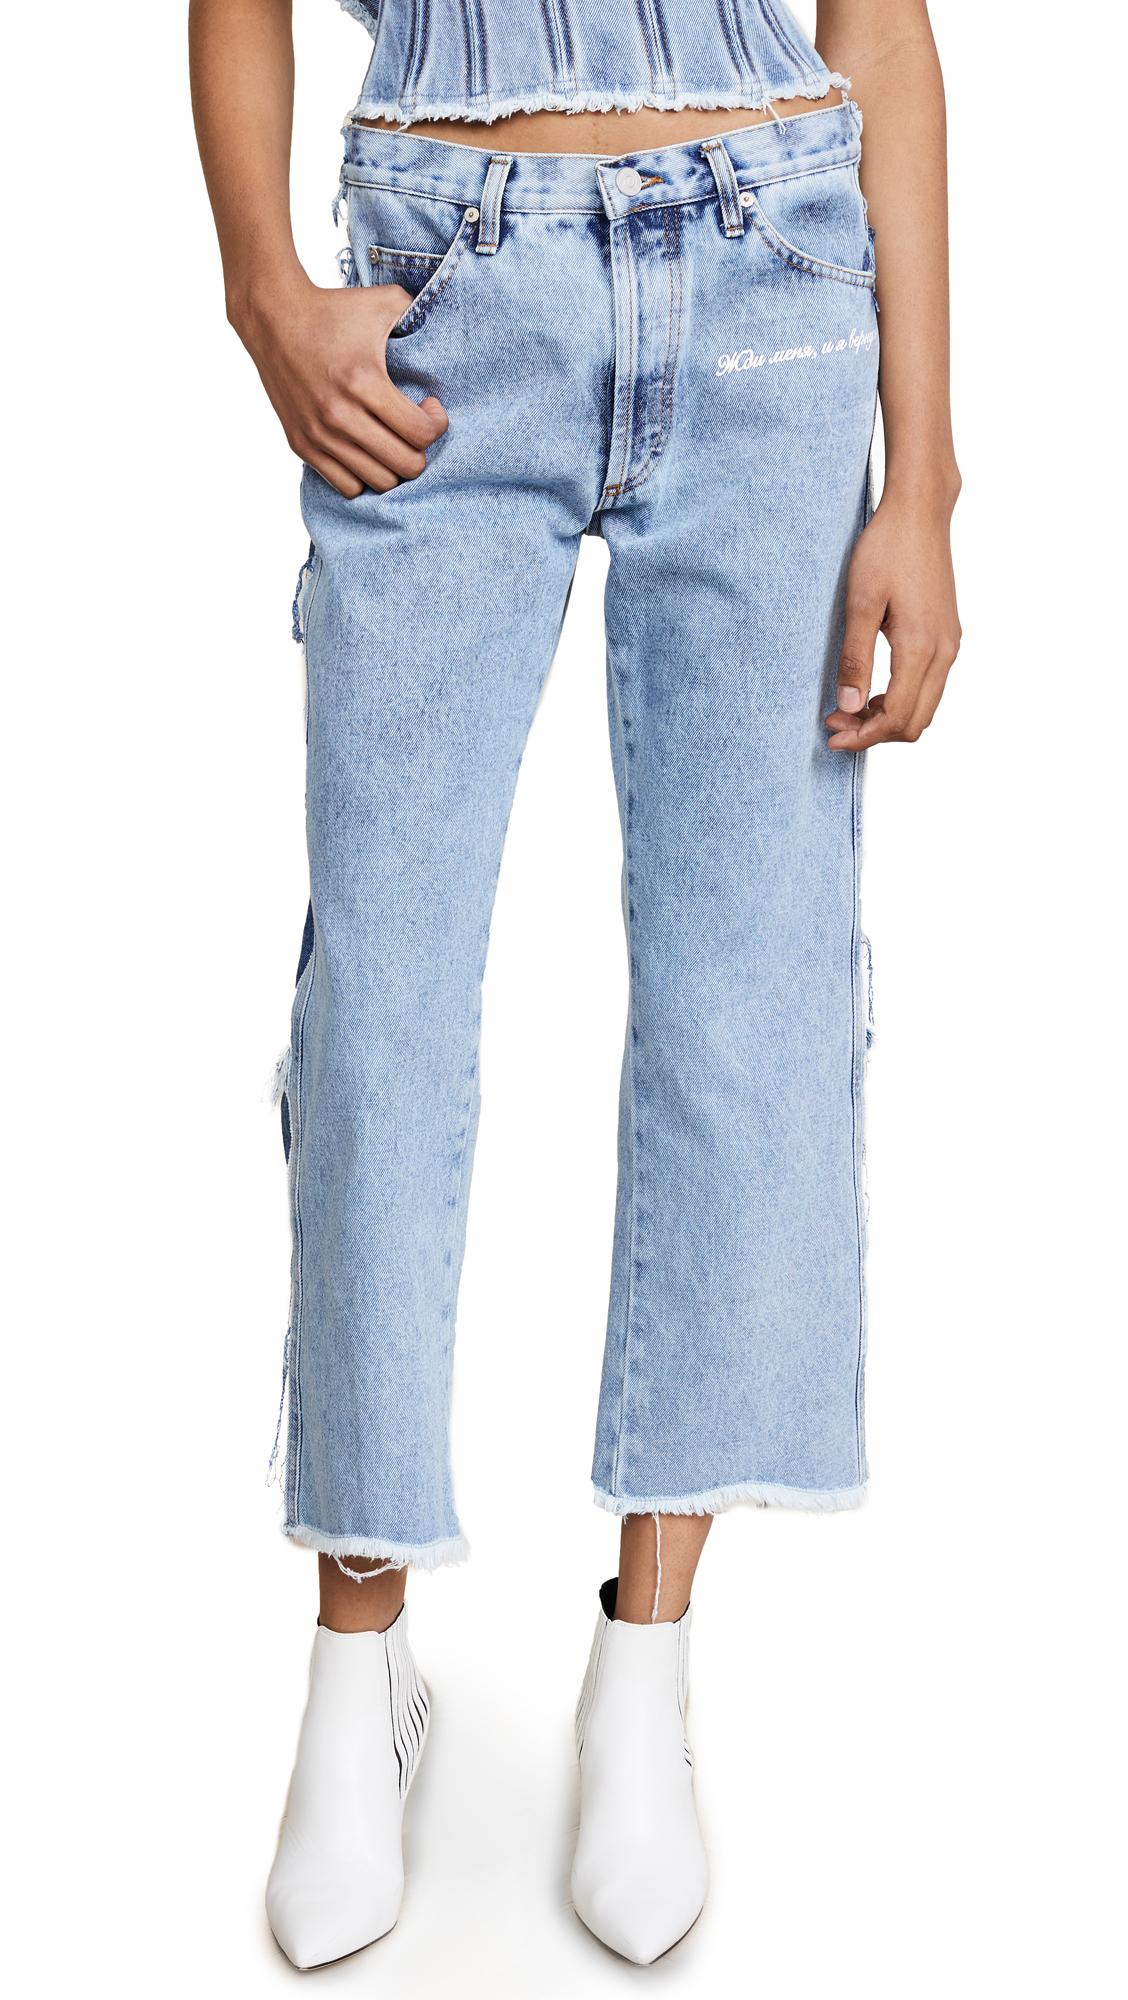 Natasha Zinko Denim Stonewash Cropped Jeans In Stonewash